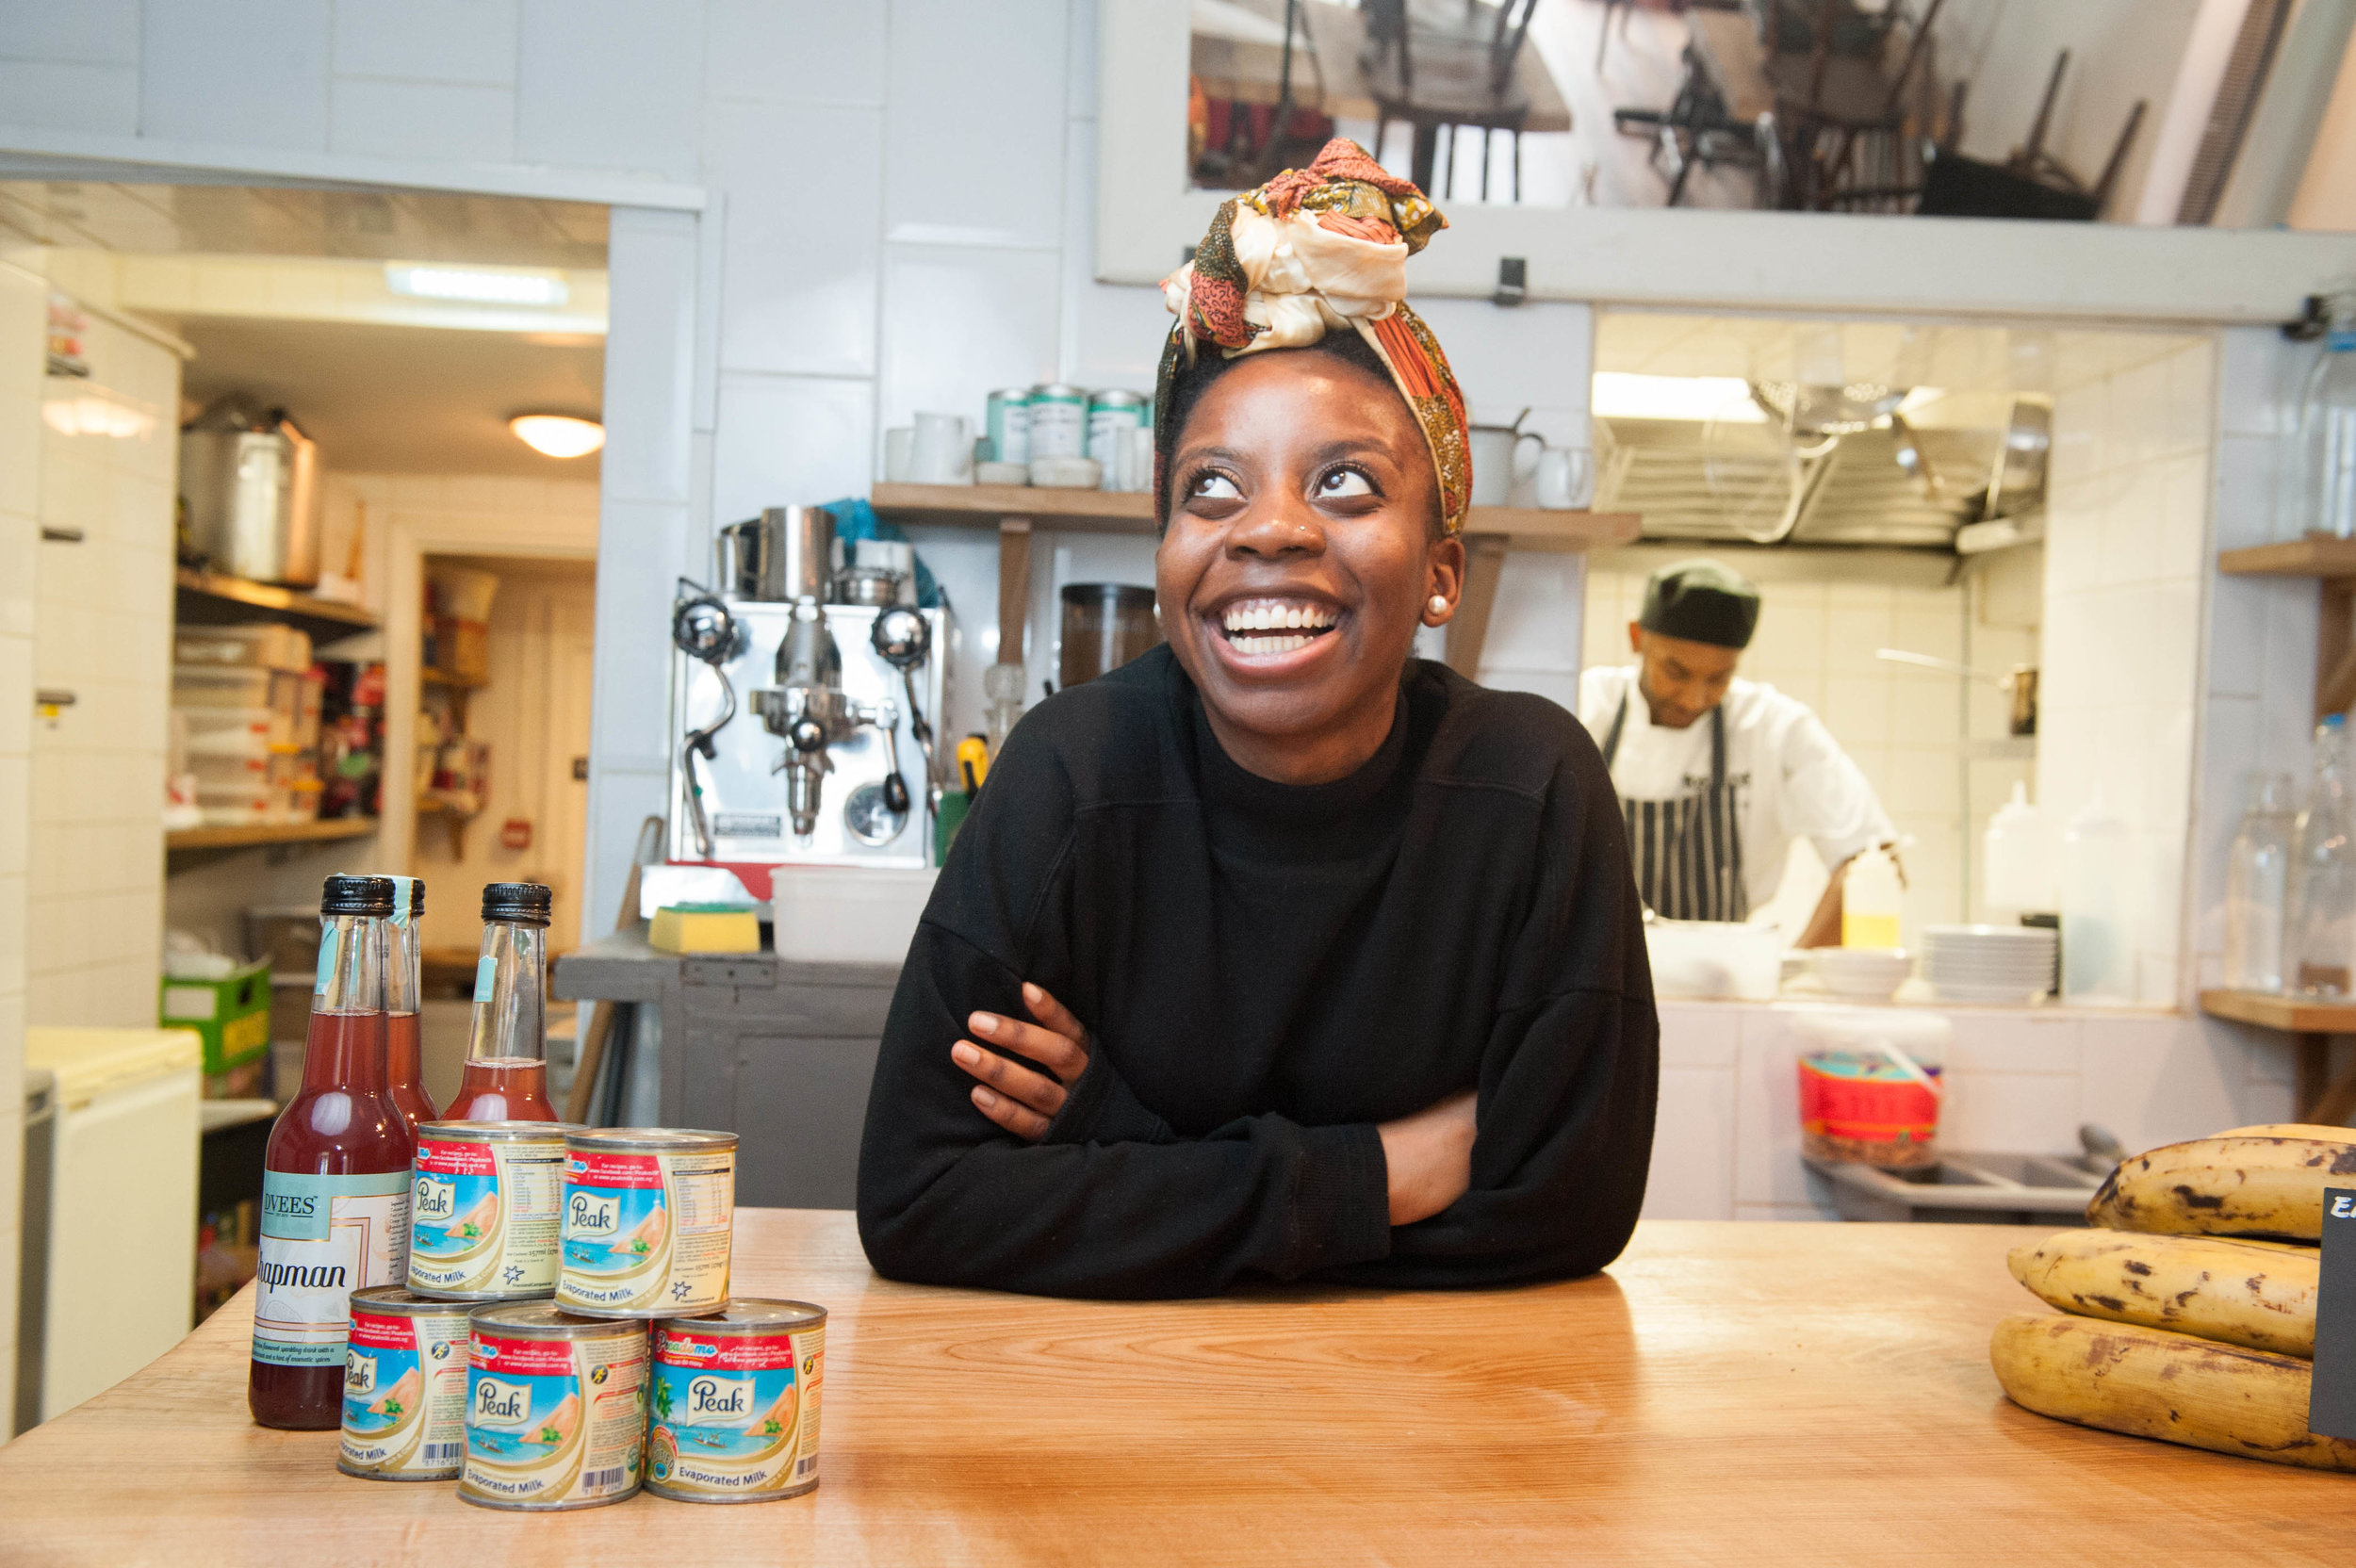 Ifeyinwa Frederick - Co-founder of 'Chukus' pop-up Nigerian Tapas restaurant in Hackney, London